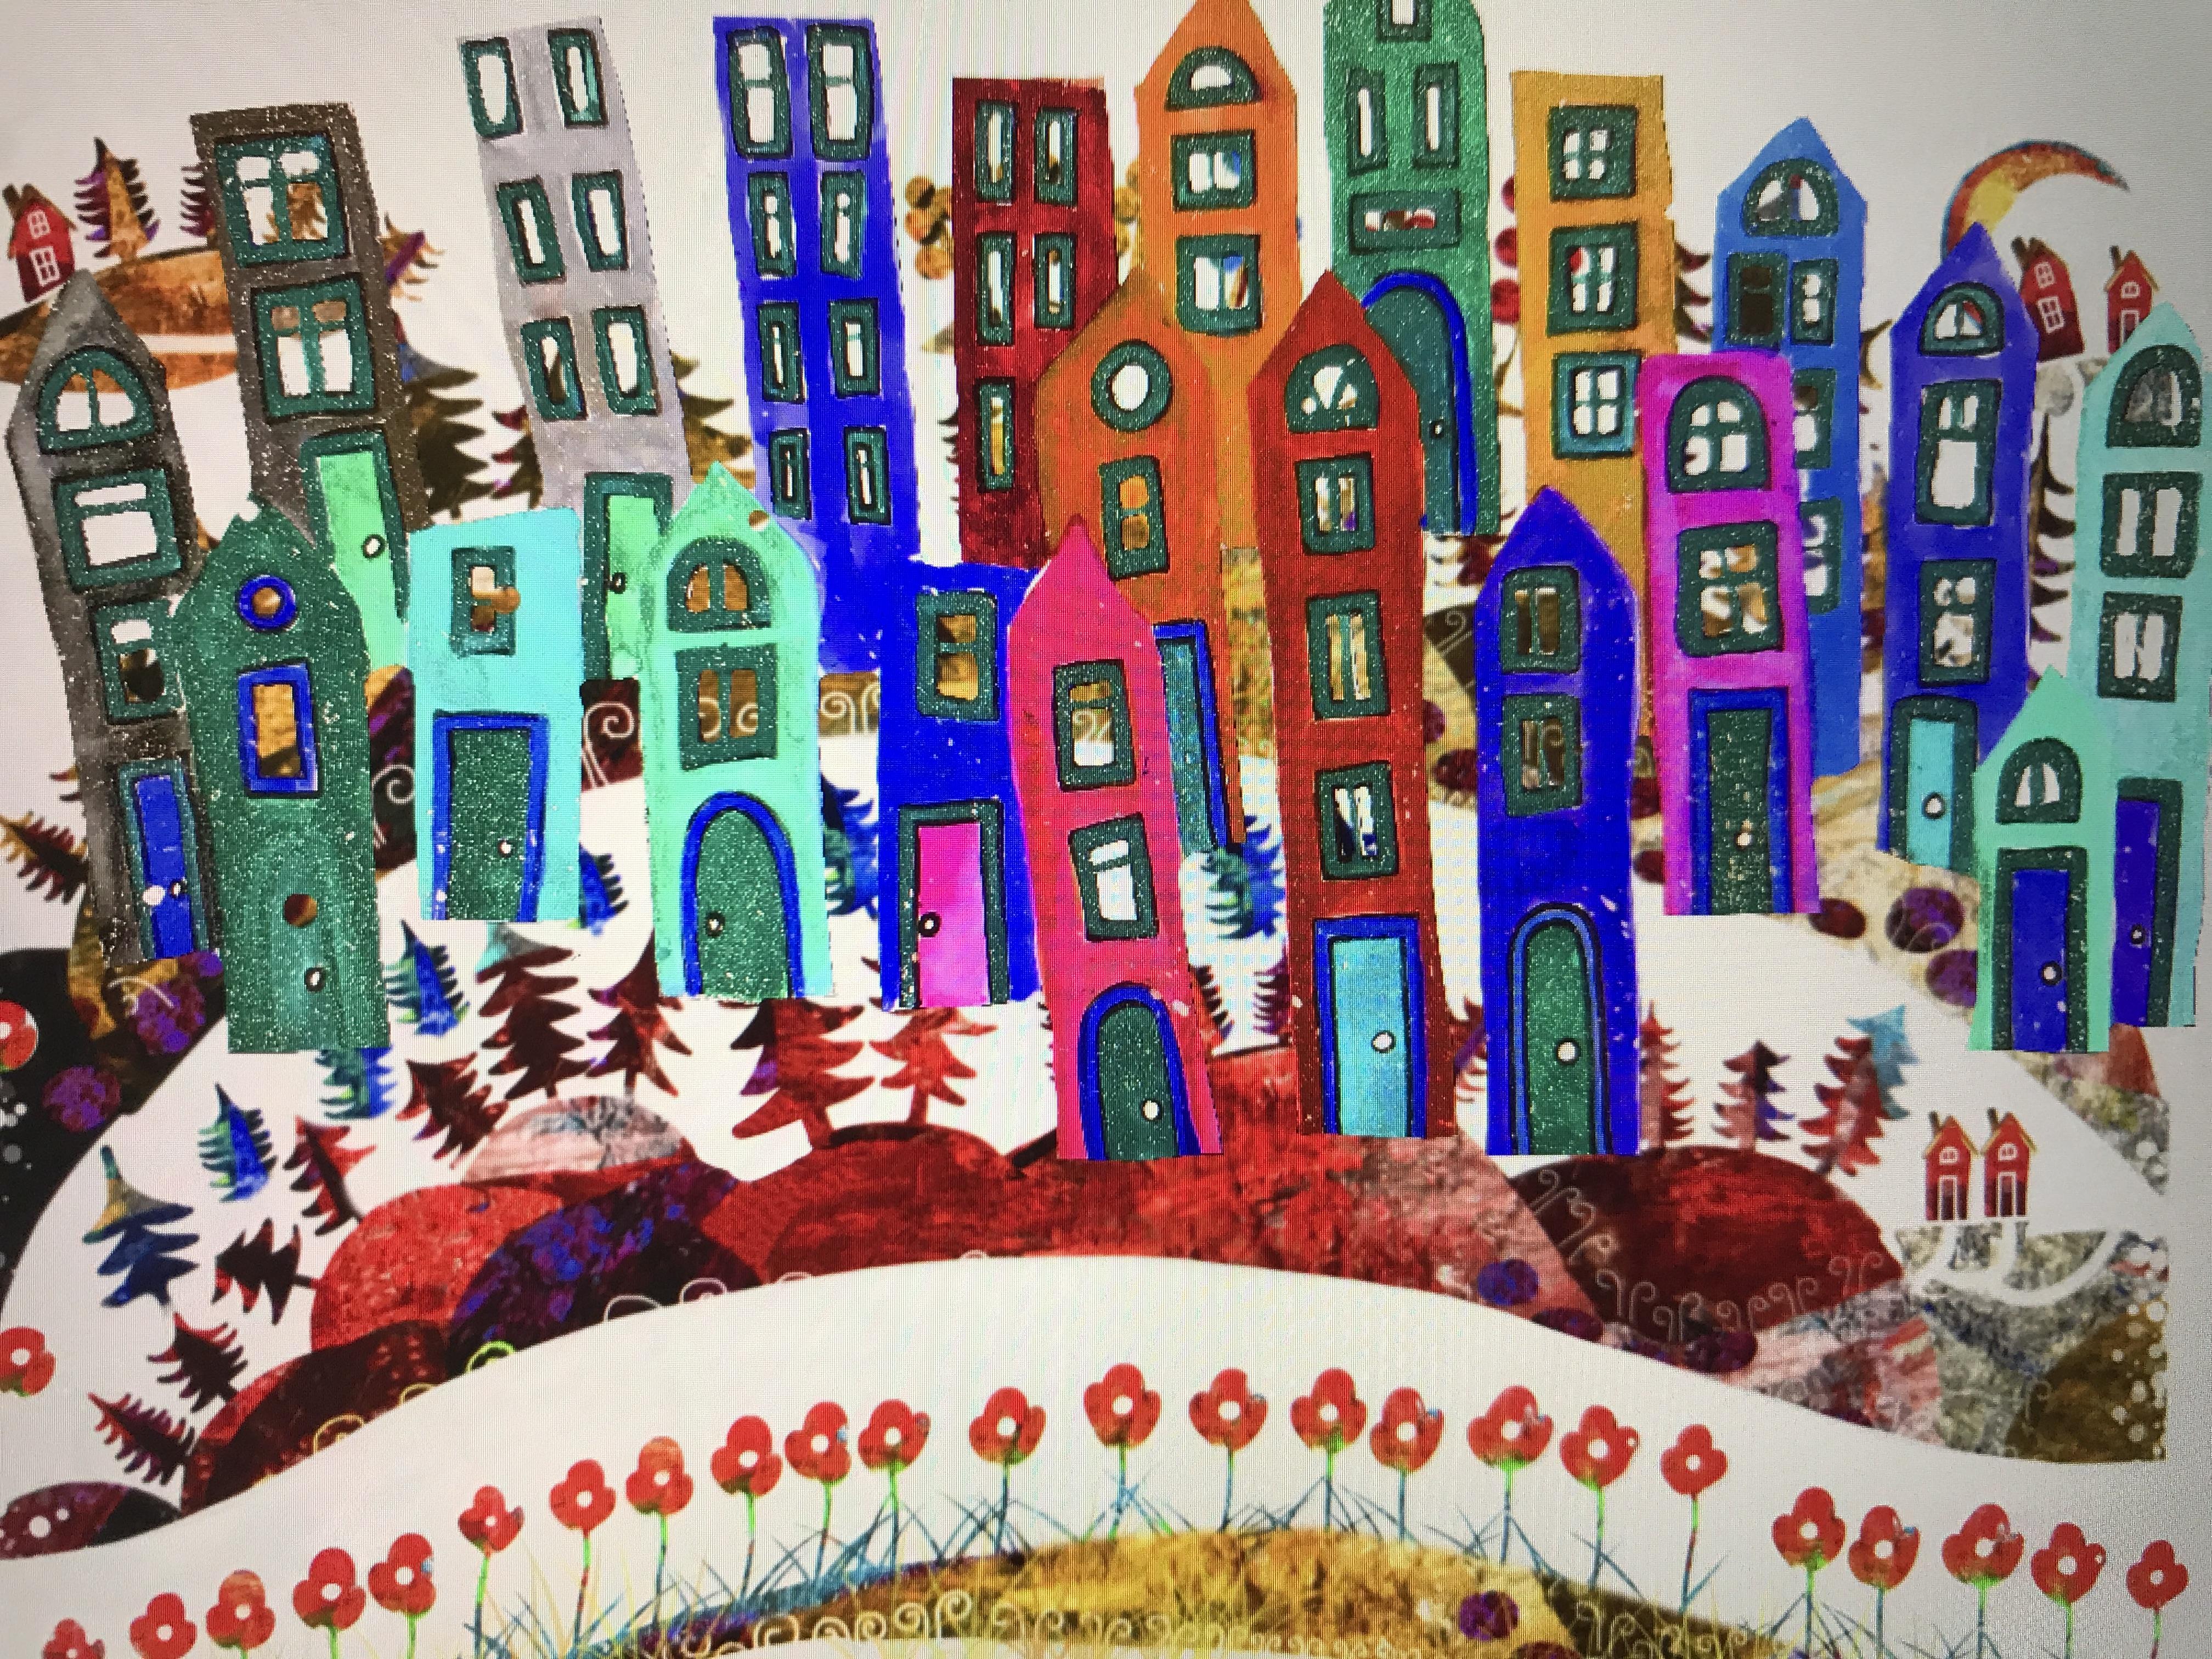 Illustration by Malin Skinnar - Houses